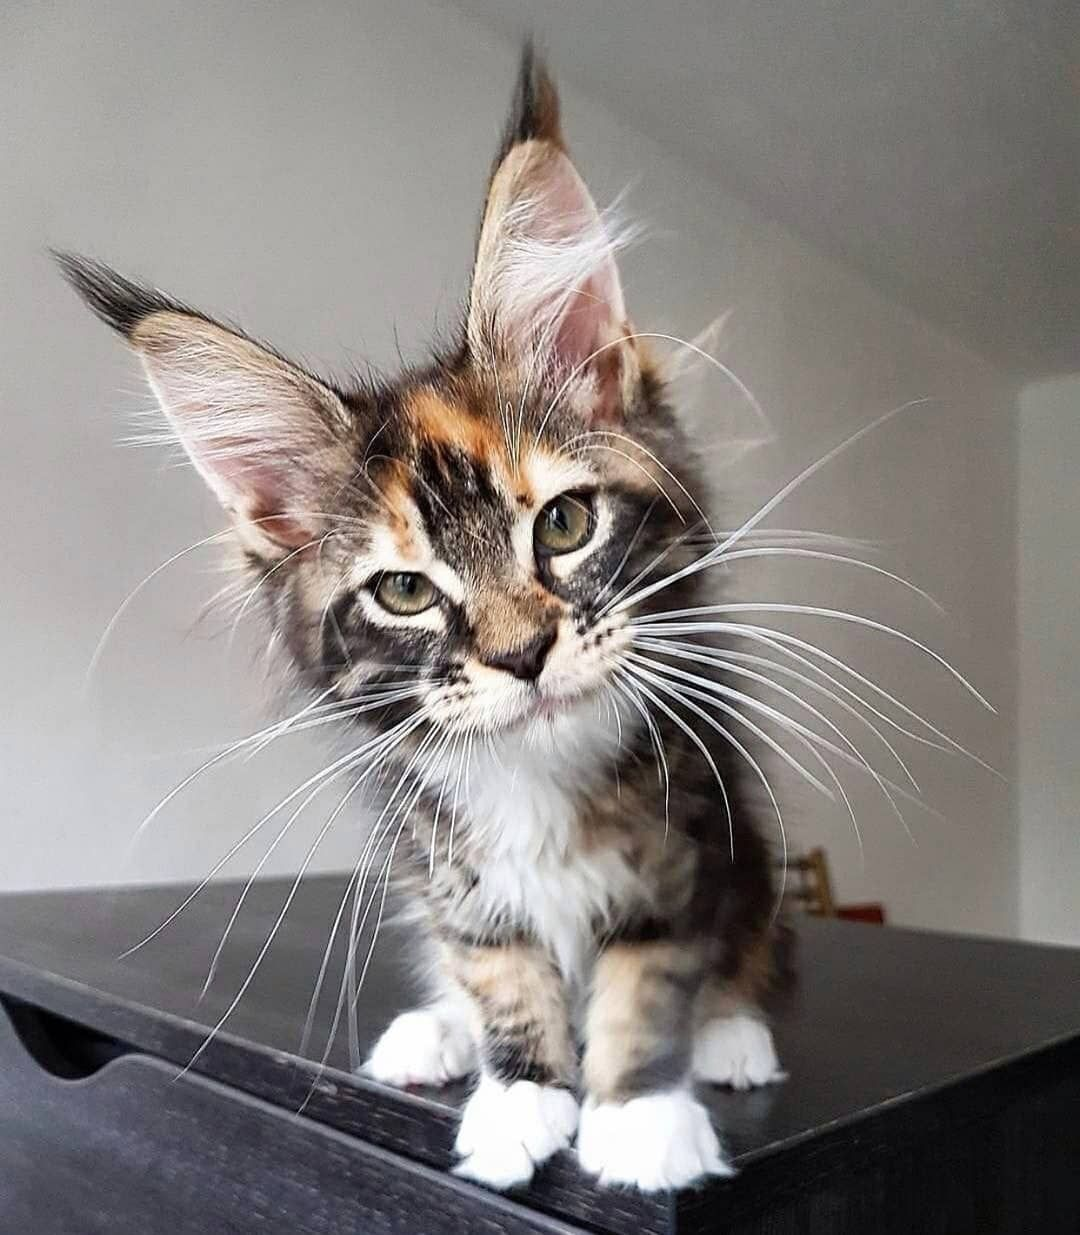 Just. Look. At. Him. 😍😍😍 Kittens cutest, Kittens, Cats